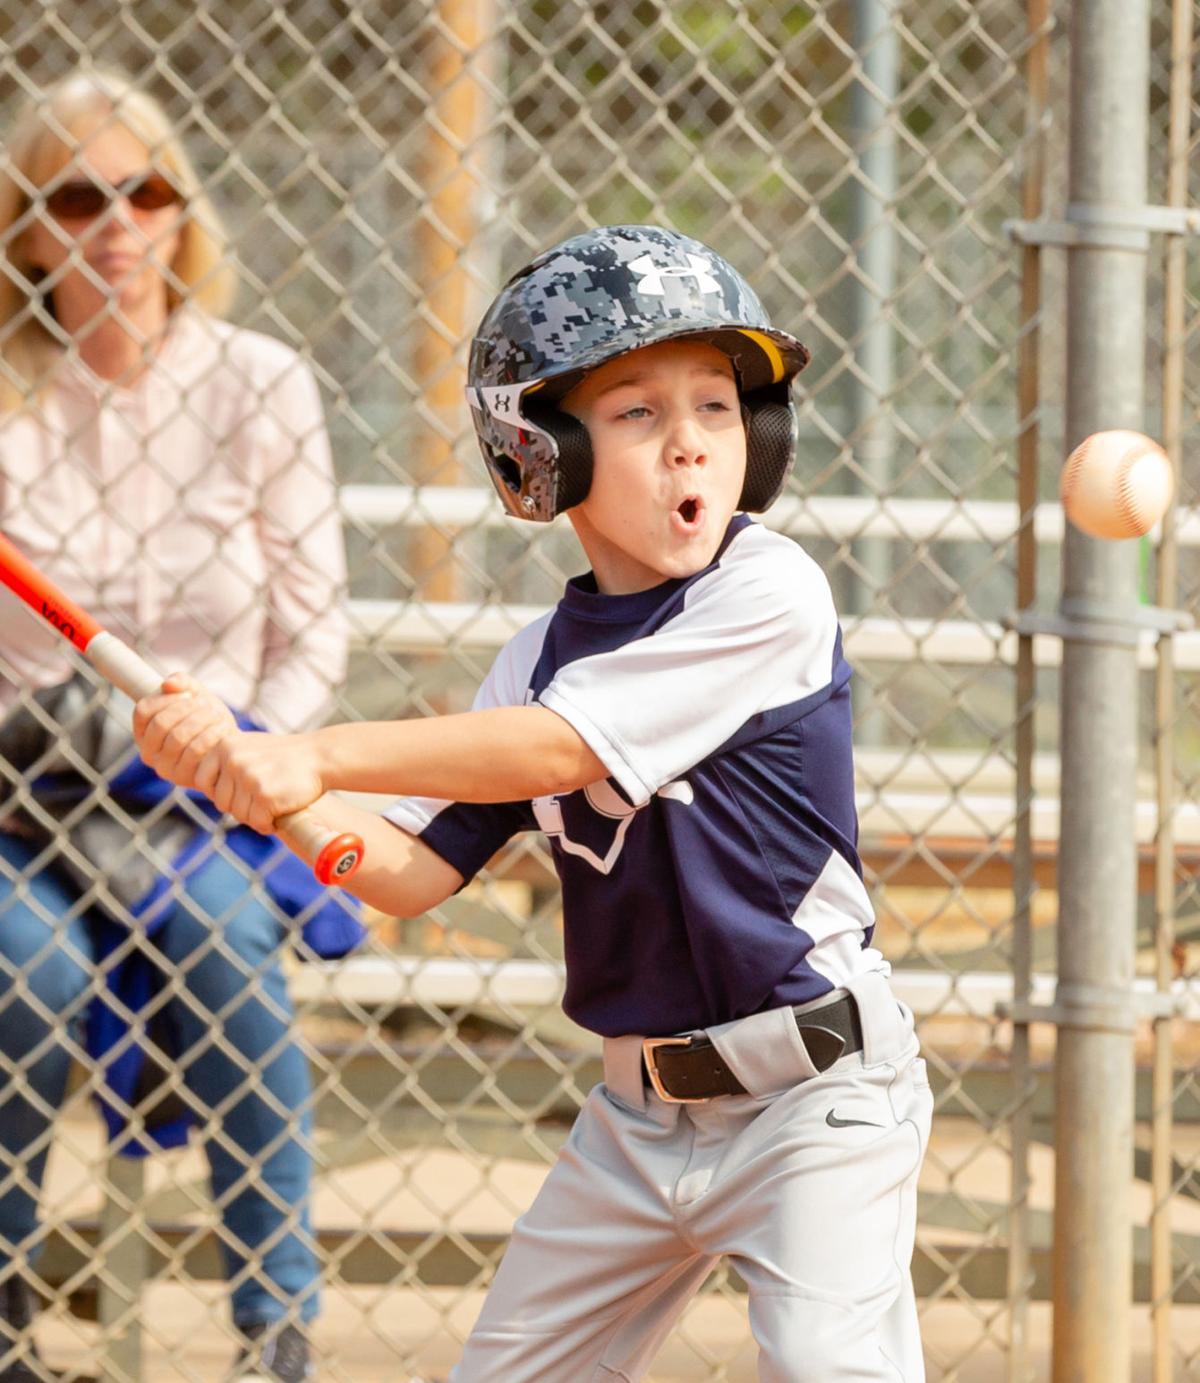 18 sports-youth sports web photo page2.jpg